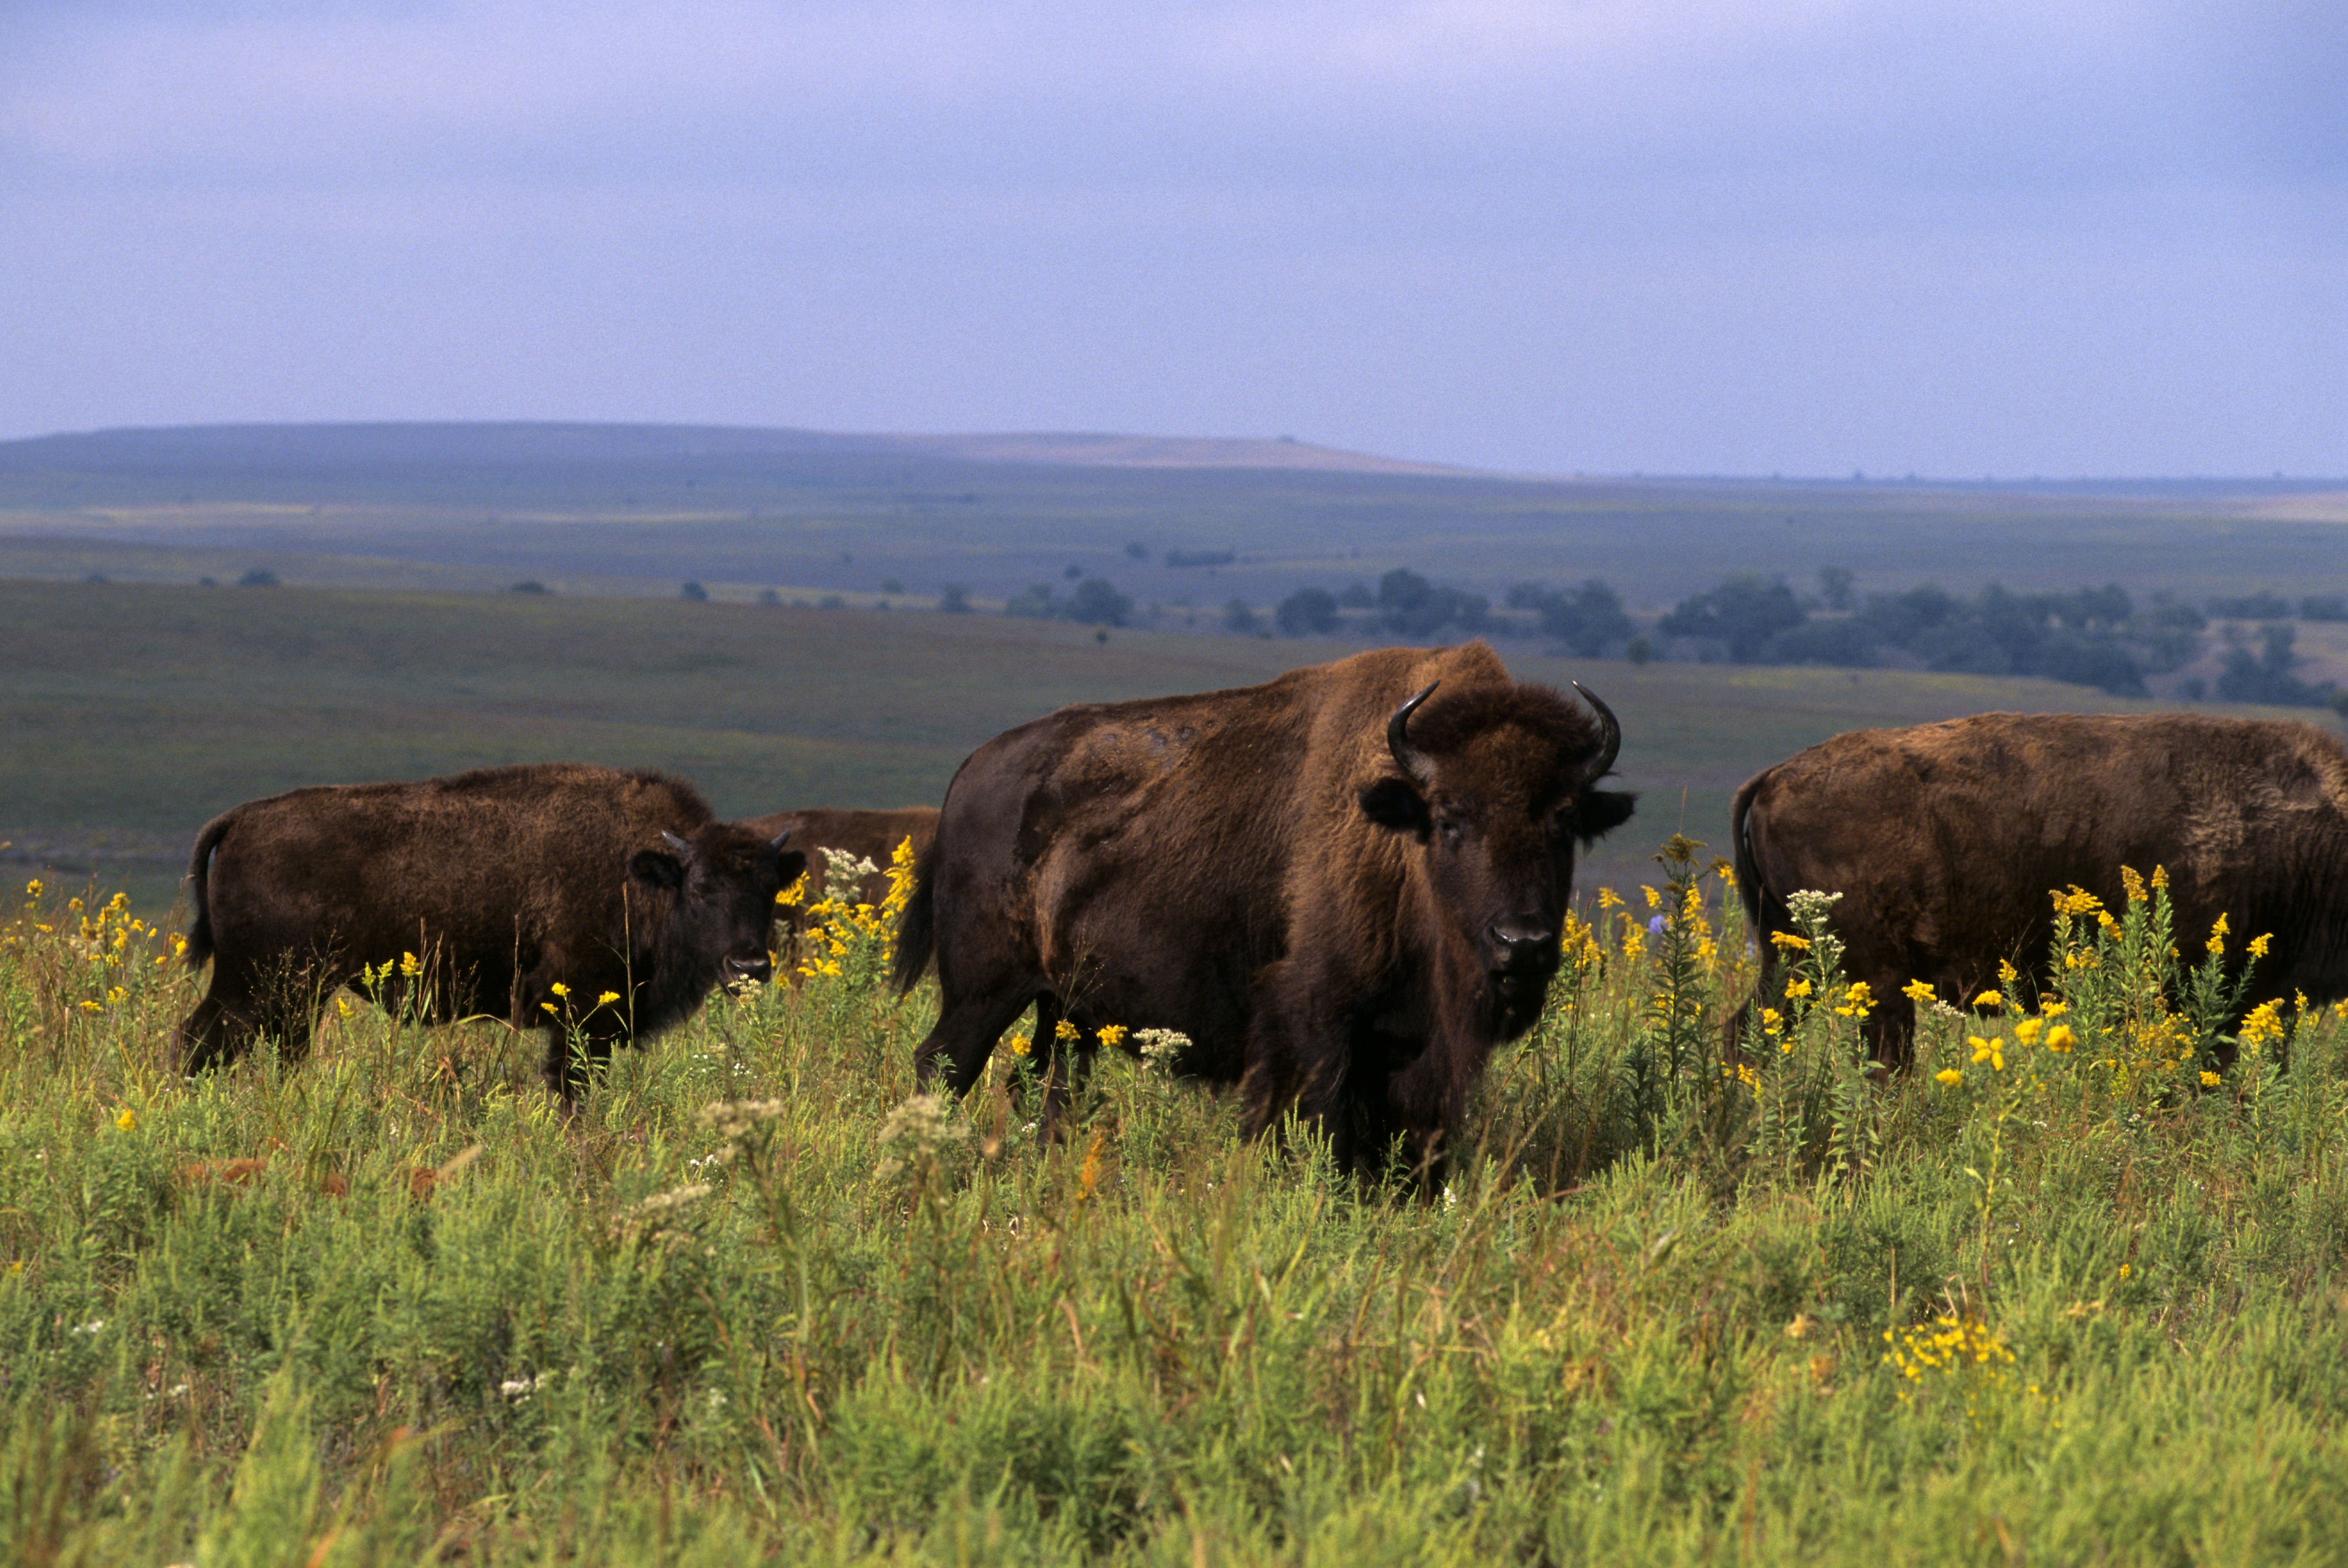 Bison near Pawhuska, Tallgrass Prairie Preserve in Oklahoma.